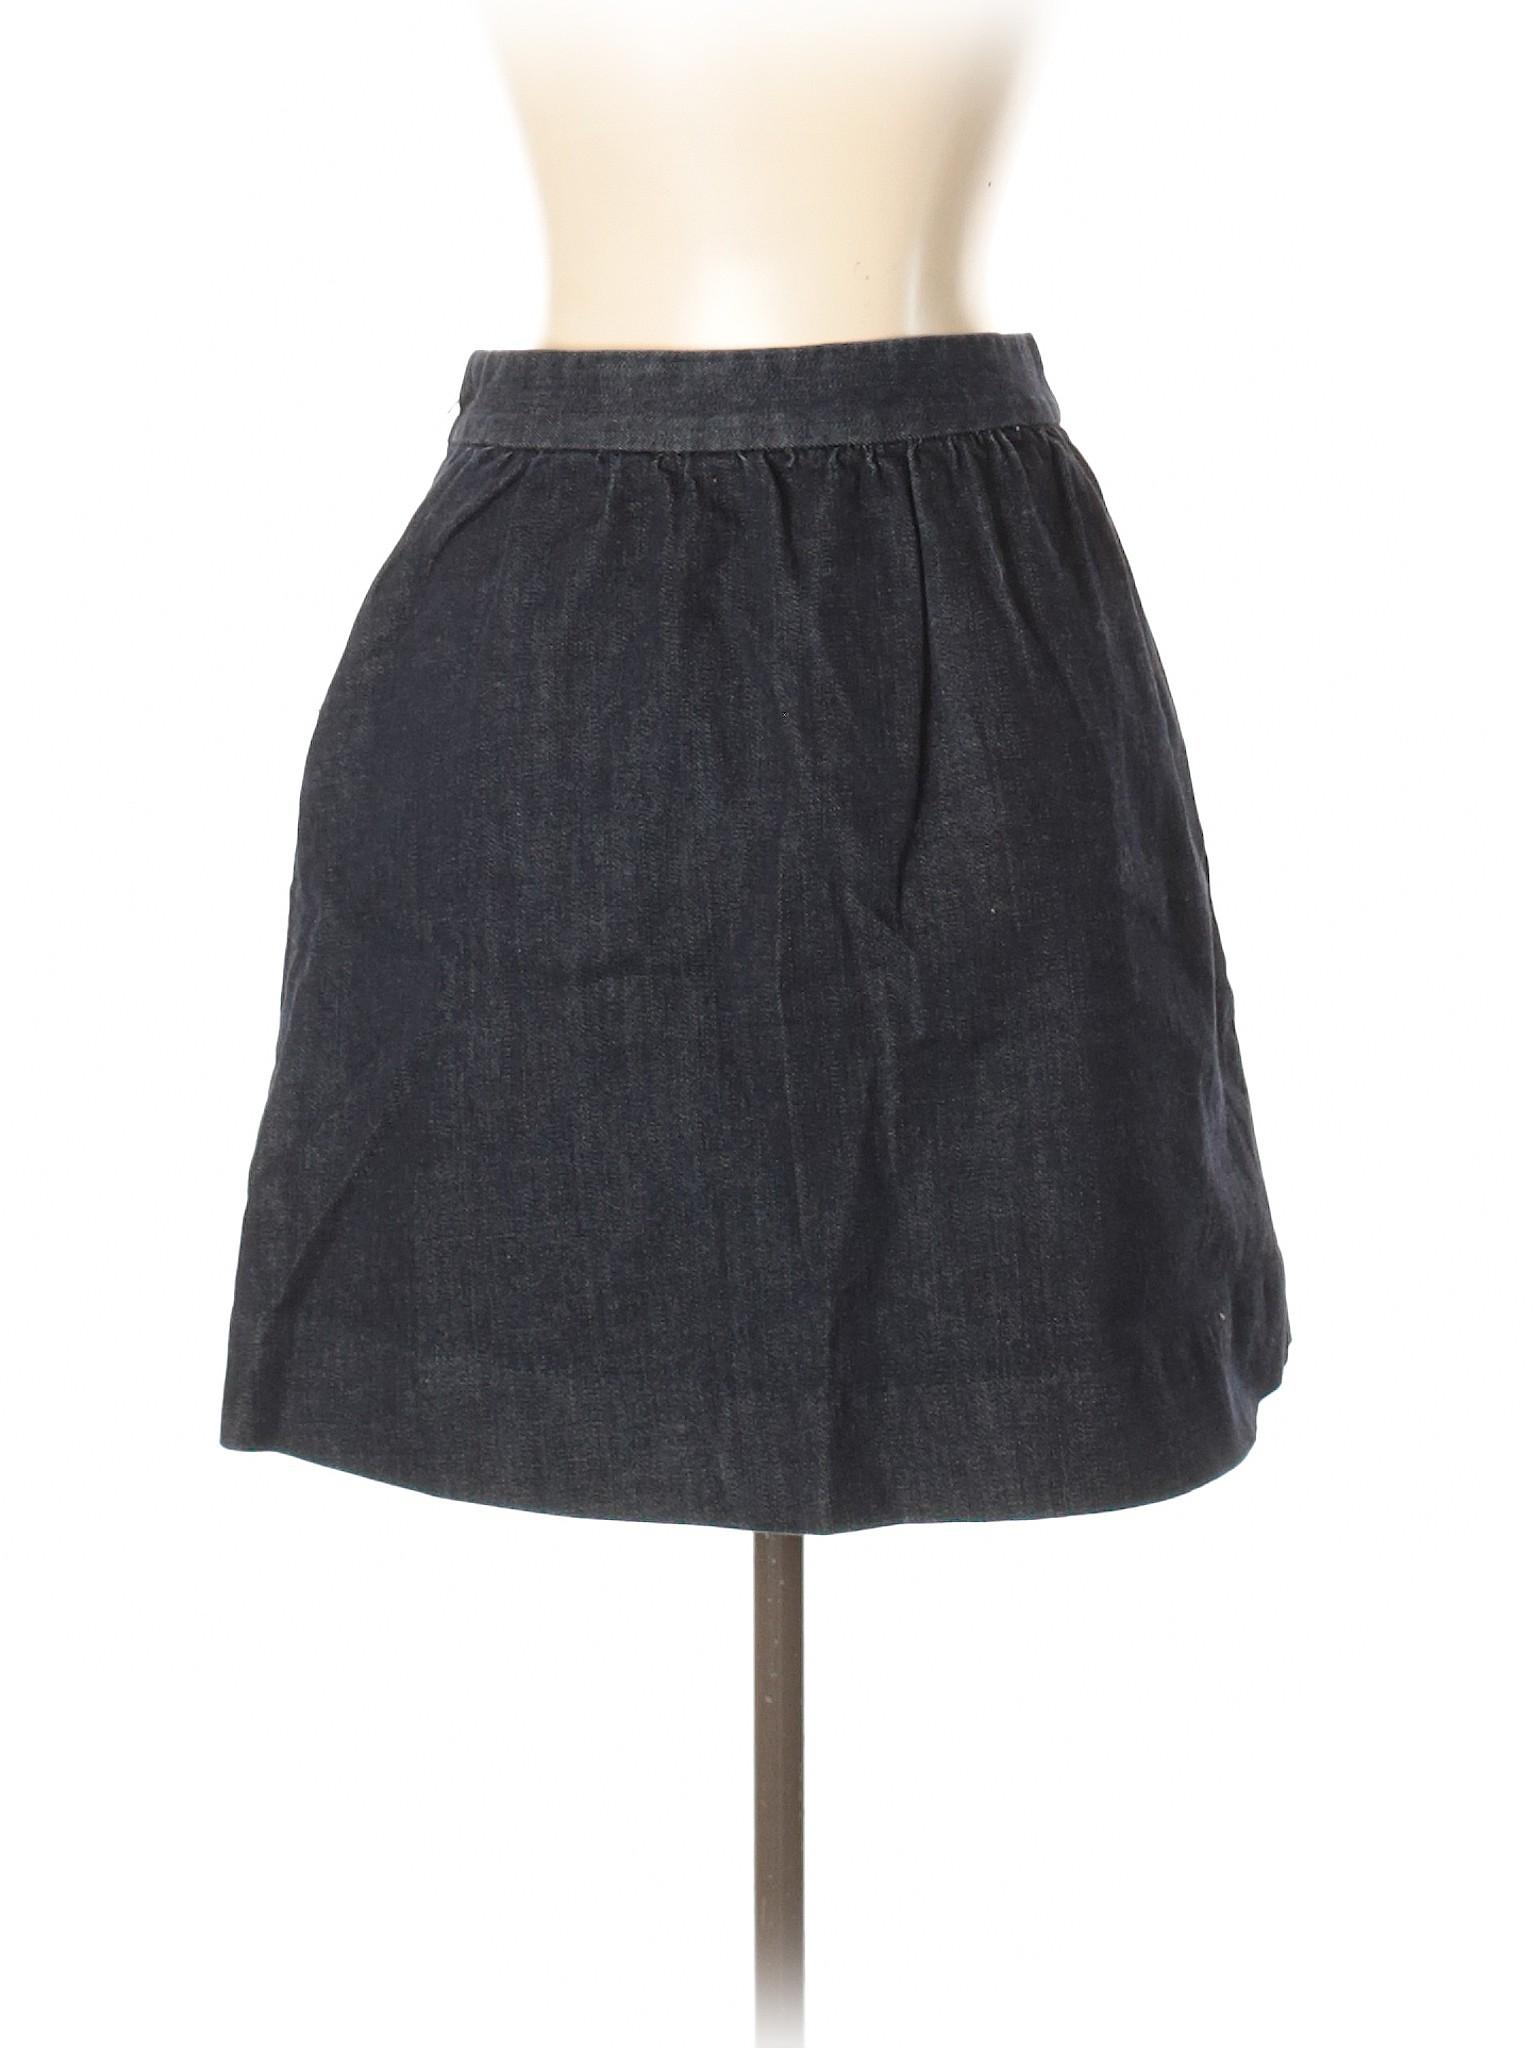 Skirt leisure Boutique Denim J Crew wgOx66dqI